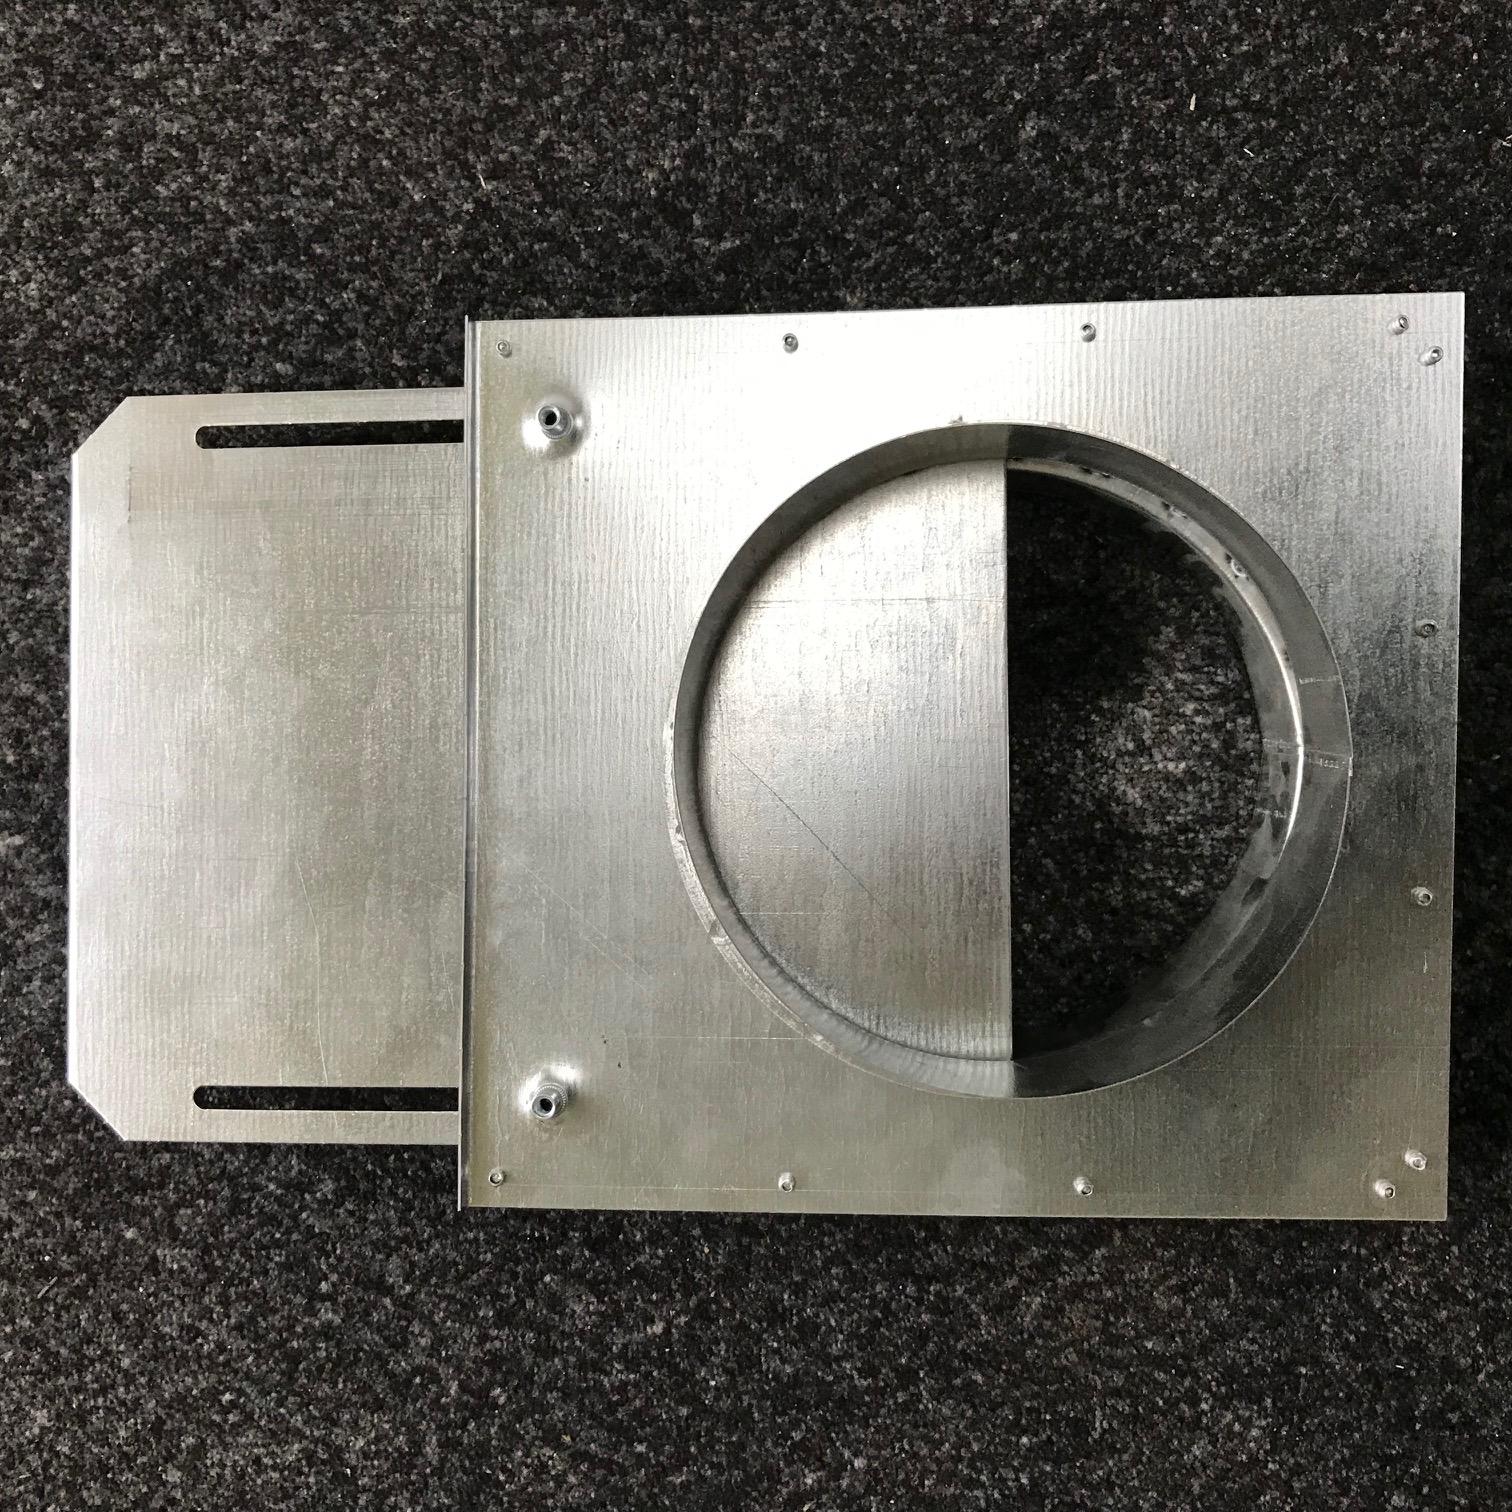 supatko-Ø100mm-uzatvaratelna-klapka